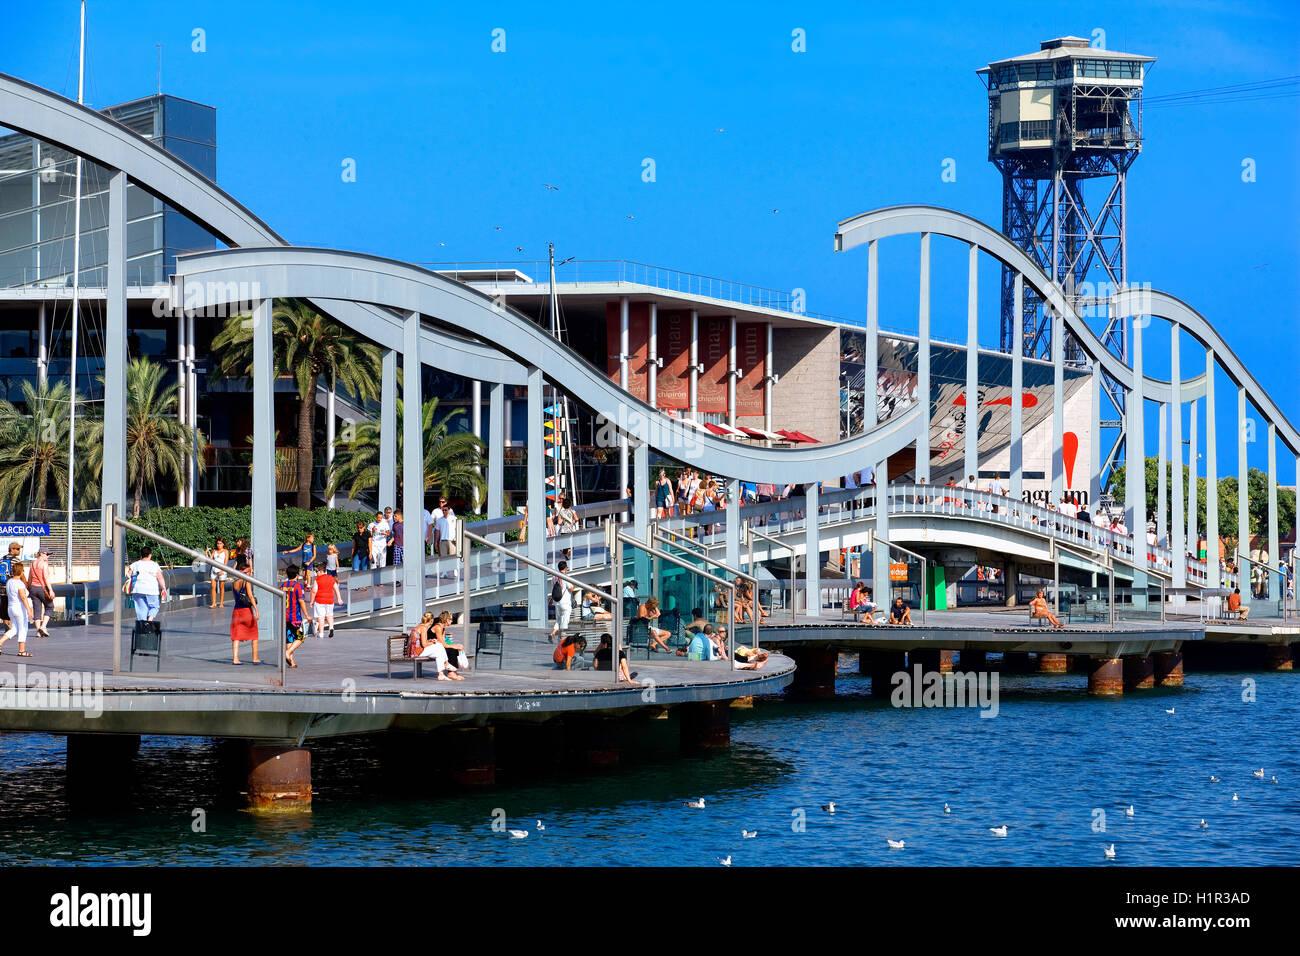 The rambla del mar,  Barcelona, Spain - Stock Image